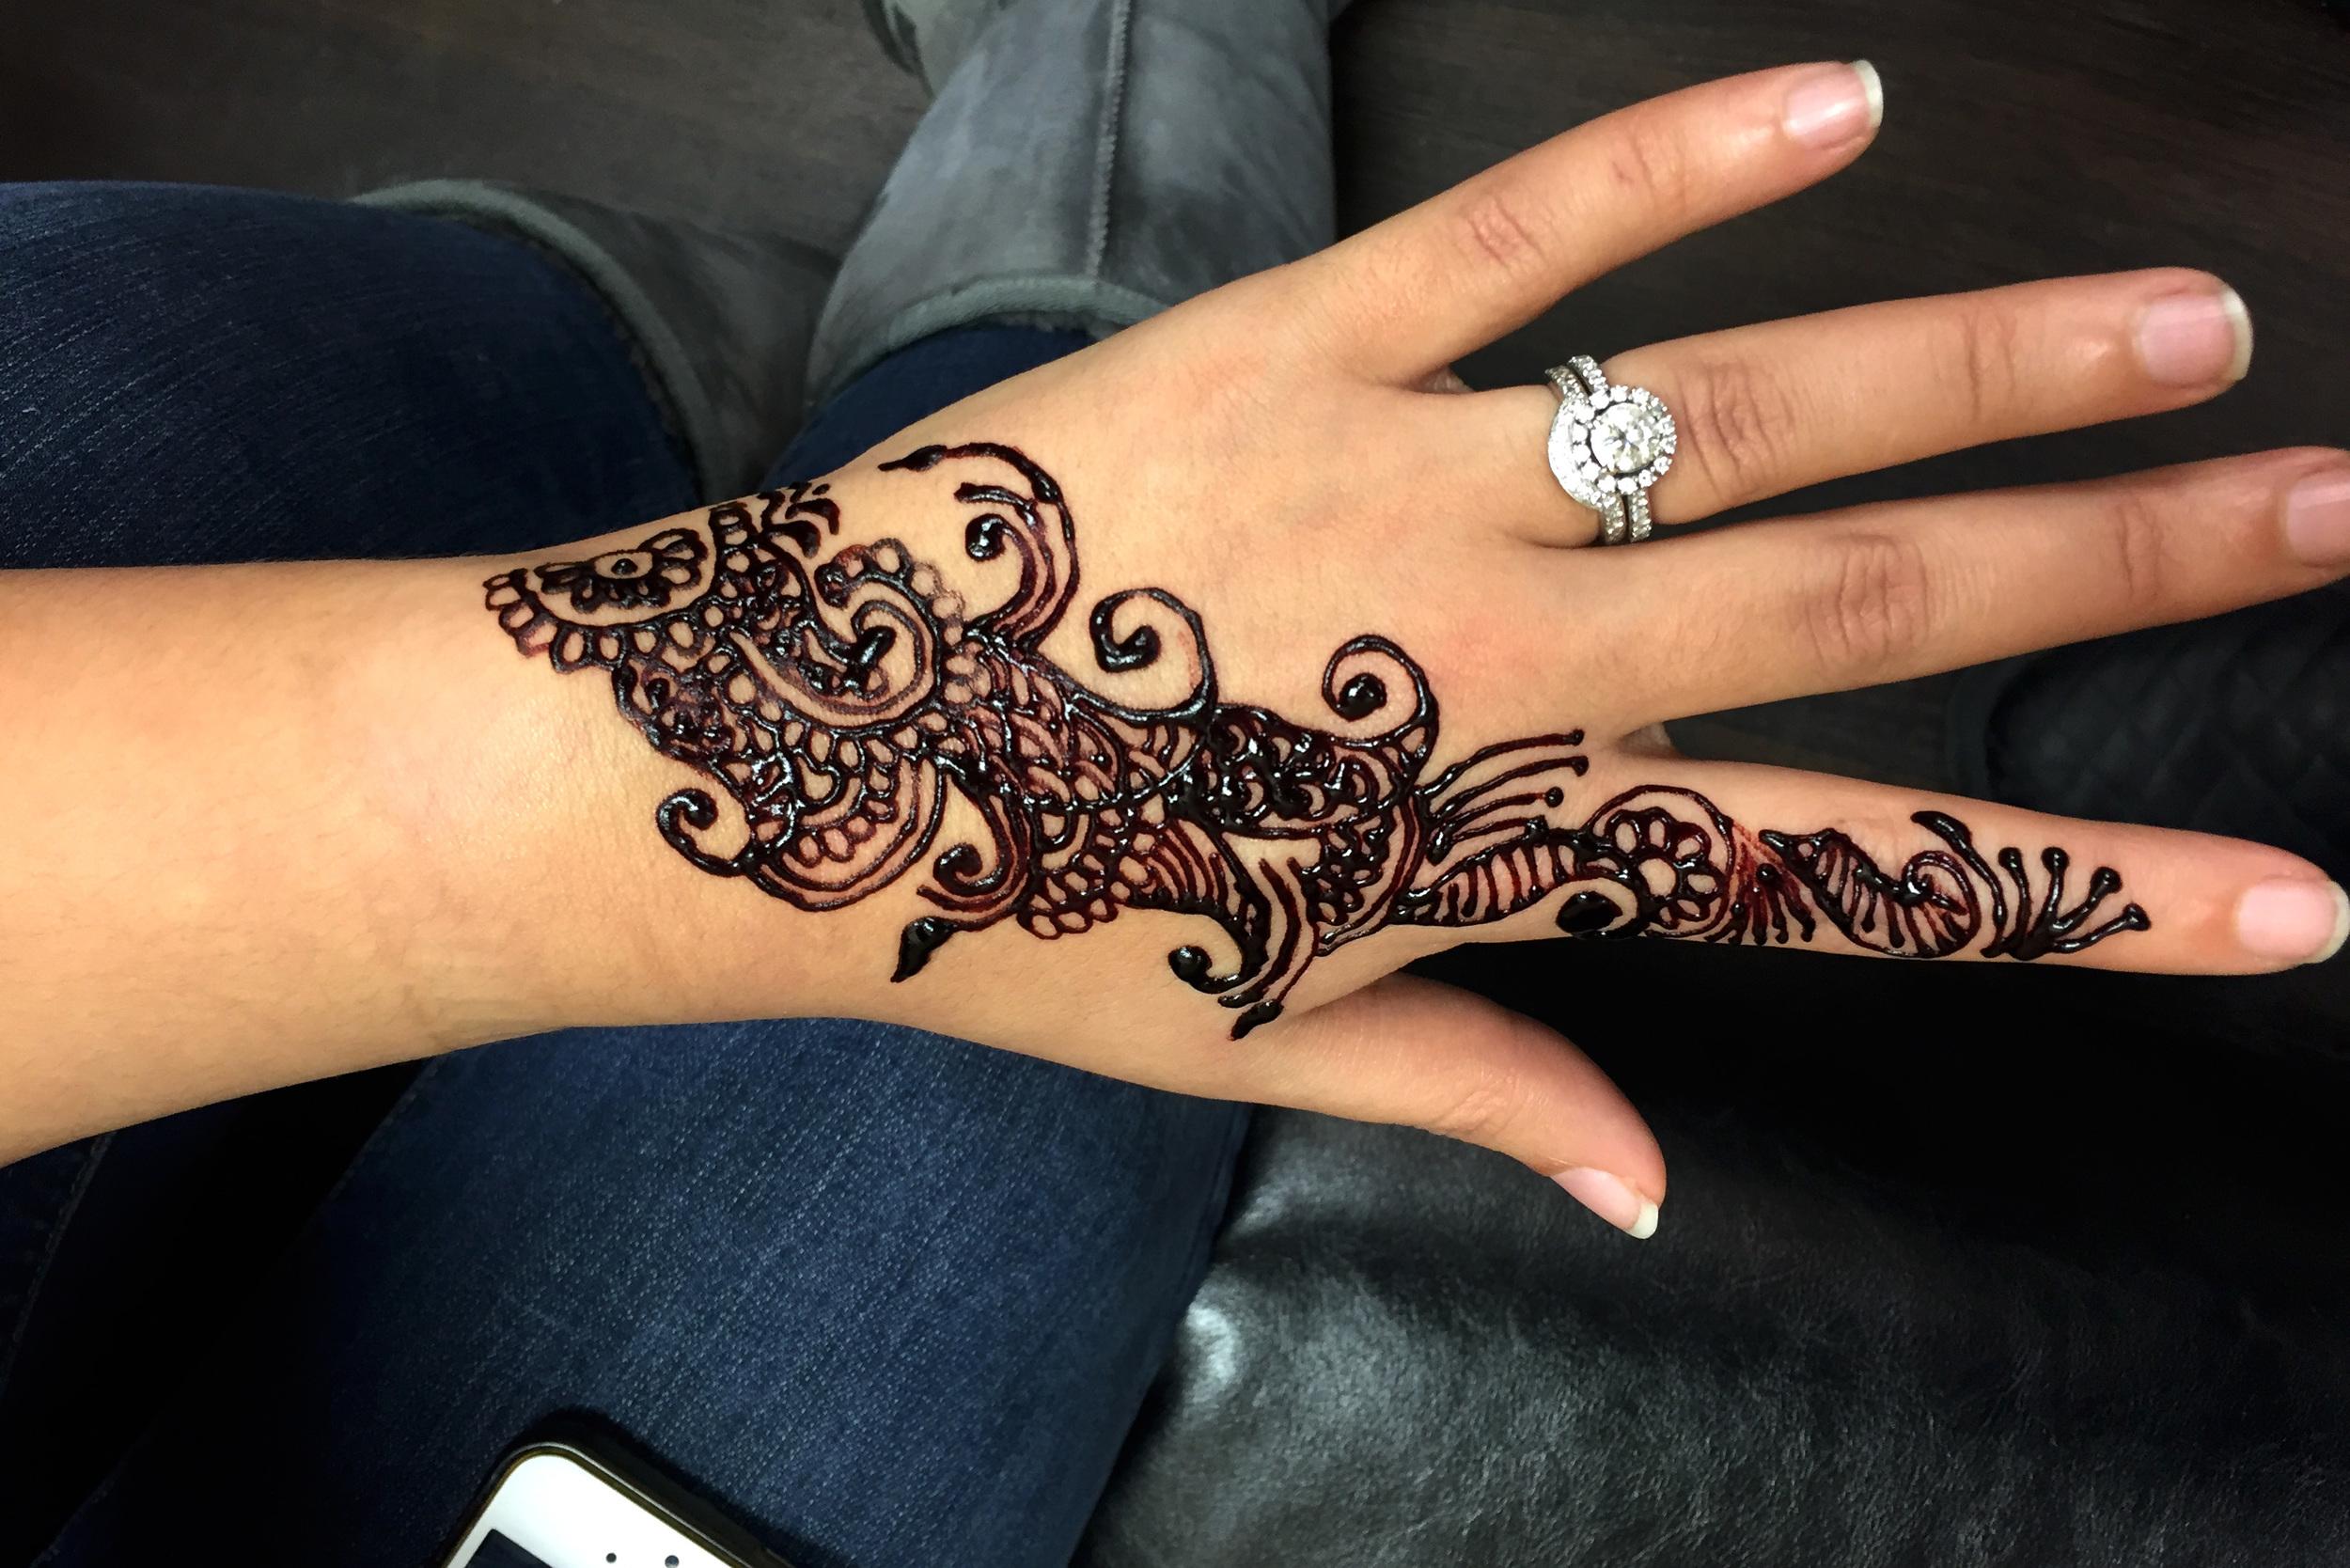 Salon_Thread_henna-tattoos_hands_1.jpg